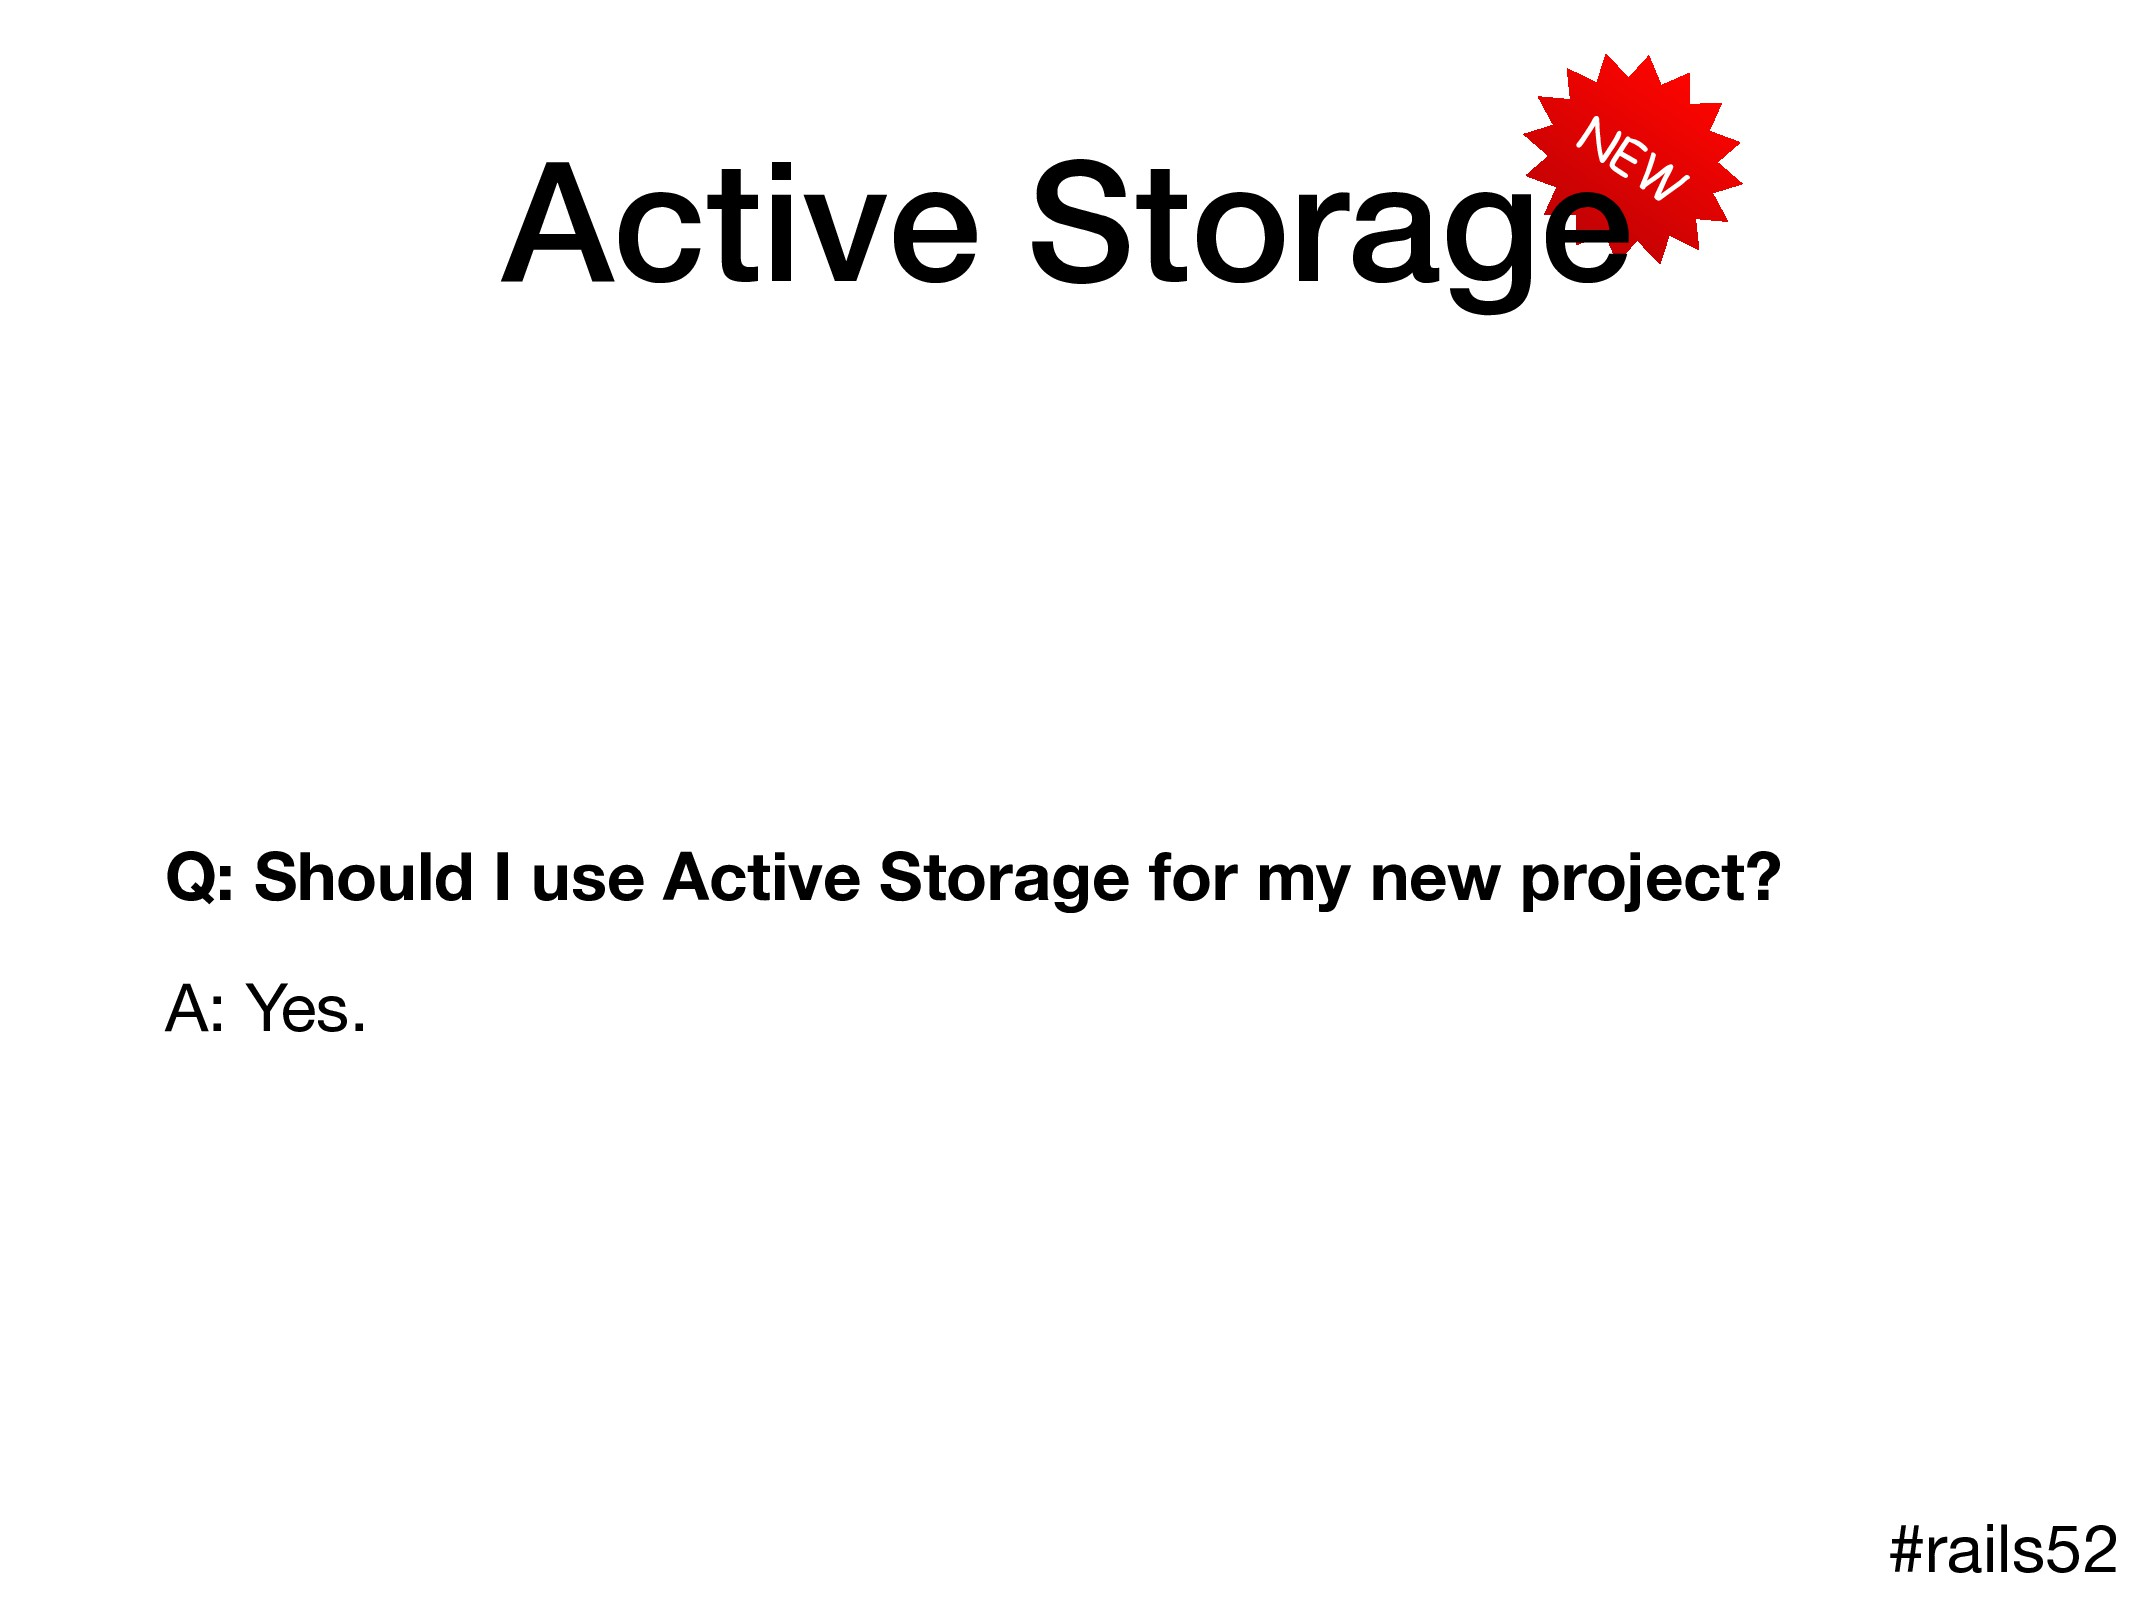 NEW Active Storage Q: Should I use Active Stora...